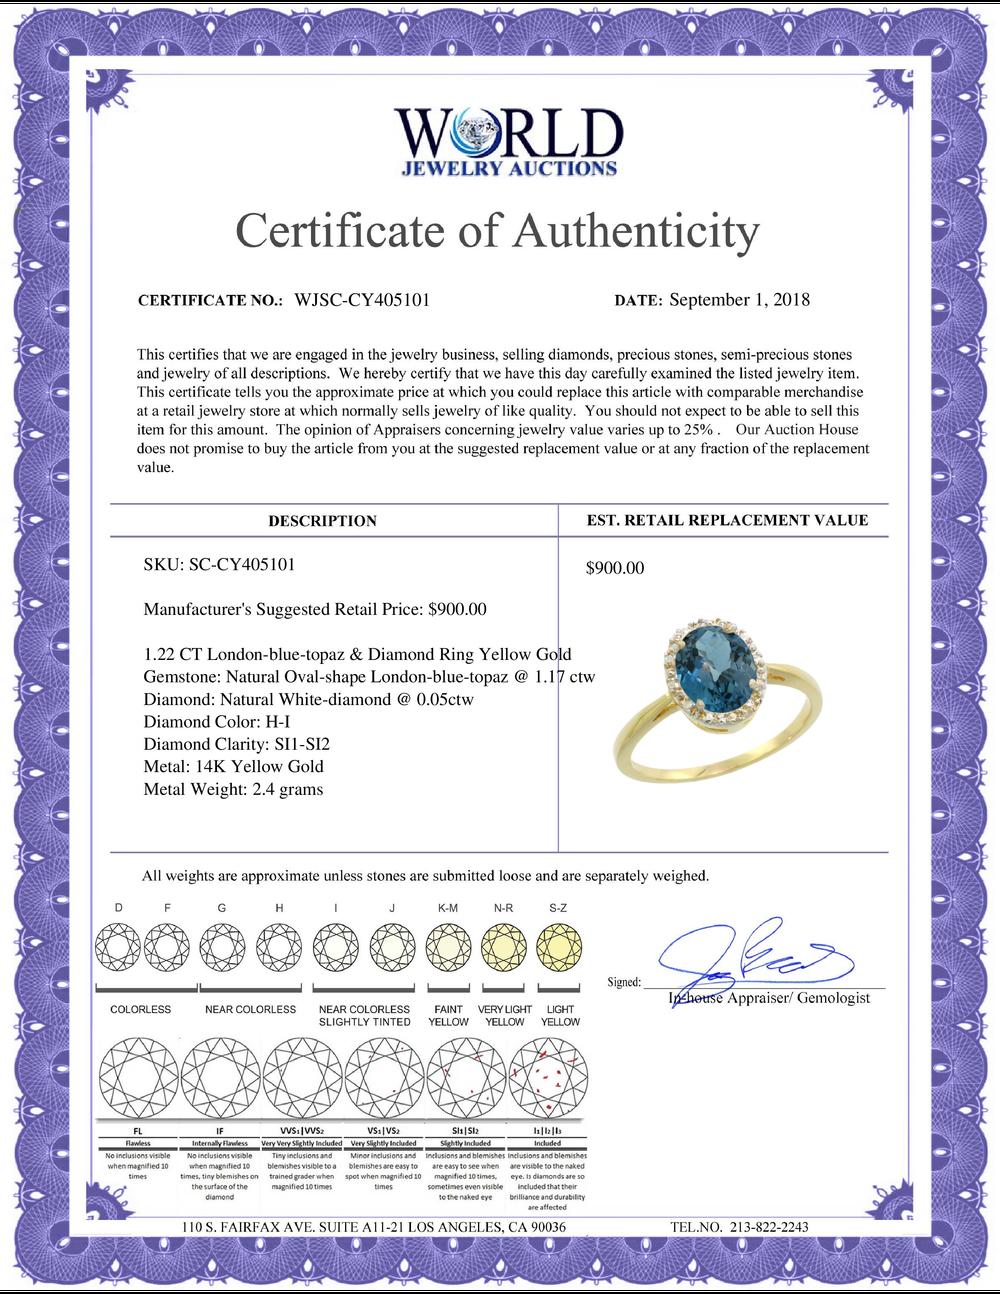 Lot 4065: Natural 1.22 ctw London-blue-topaz & Diamond Engagement Ring 14K Yellow Gold - REF-27A3V